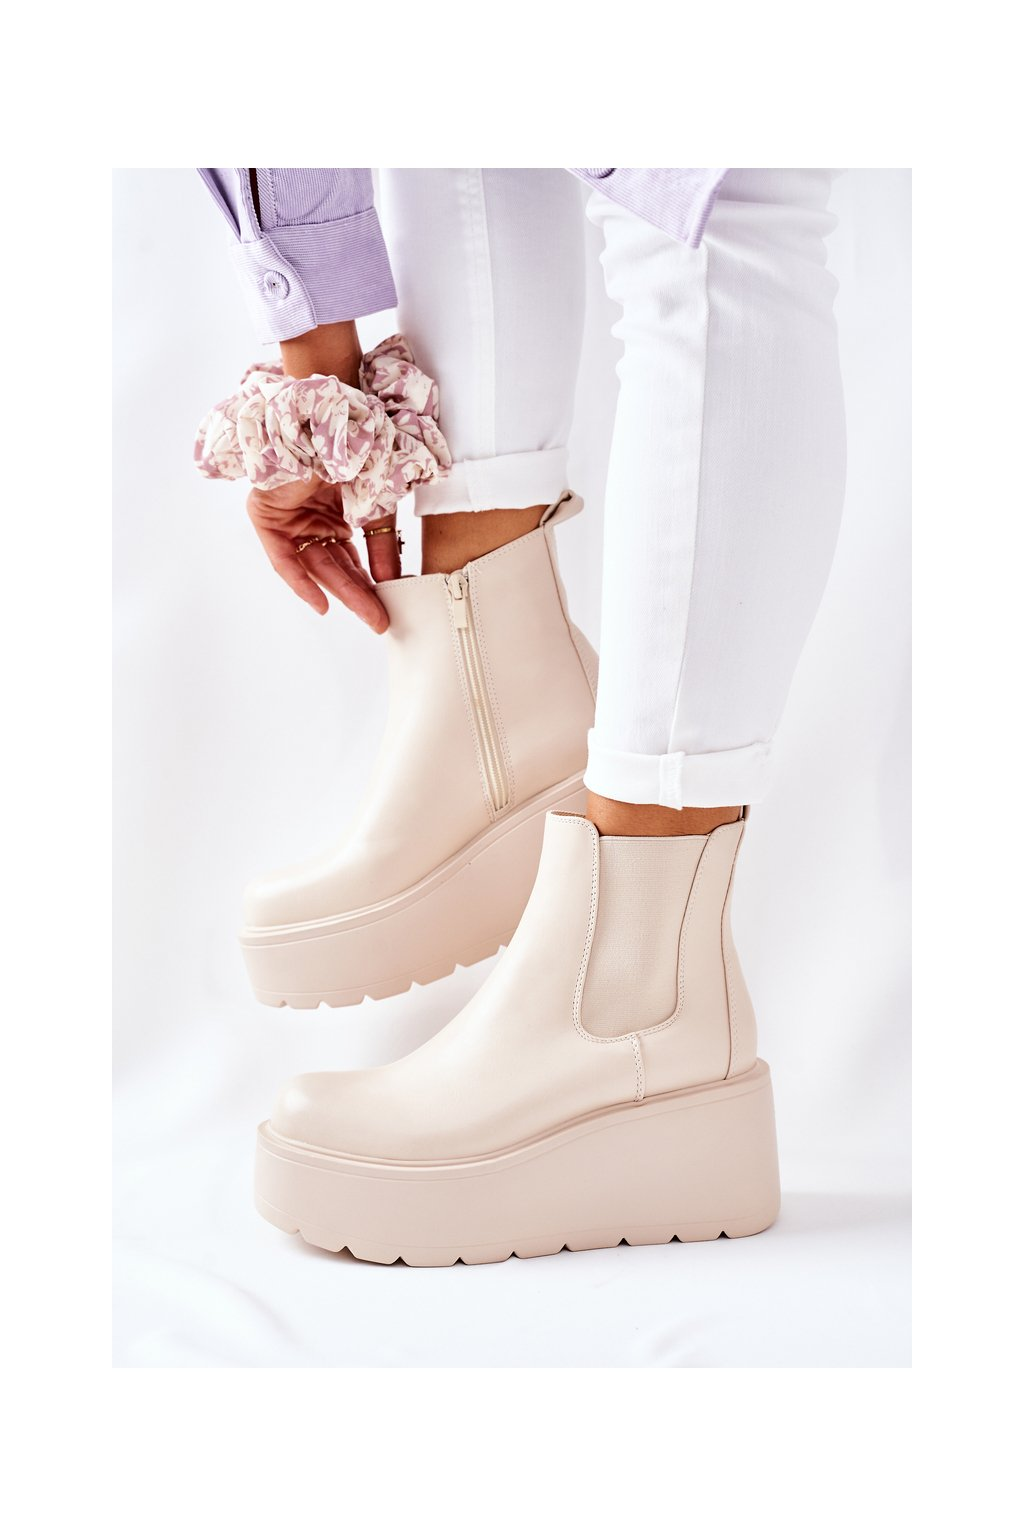 Členkové topánky na podpätku farba hnedá kód obuvi QT22 BEIGE